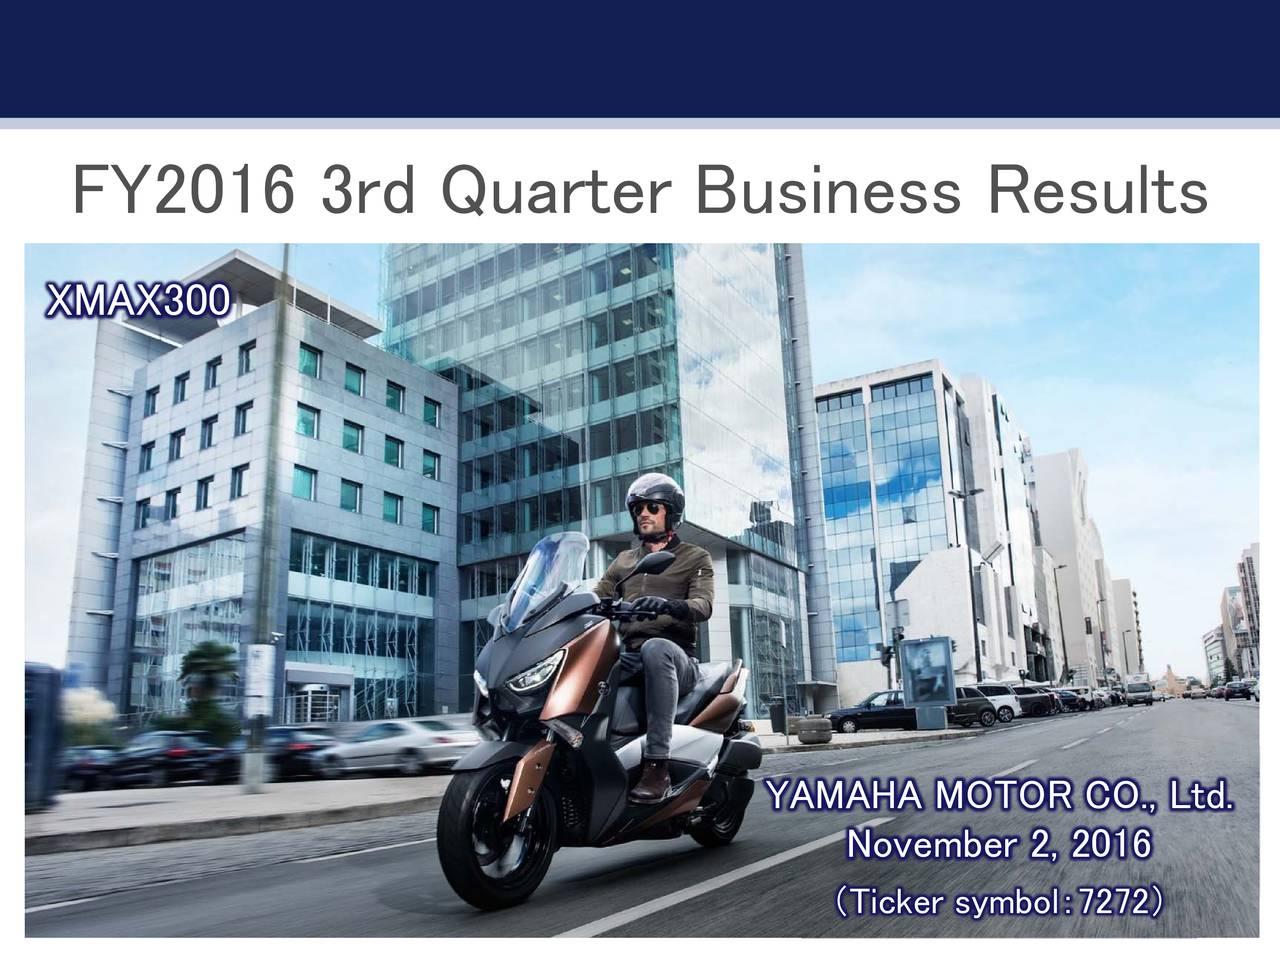 yamaha motor co ltd adr 2016 q3 results earnings call slides [ 1280 x 960 Pixel ]